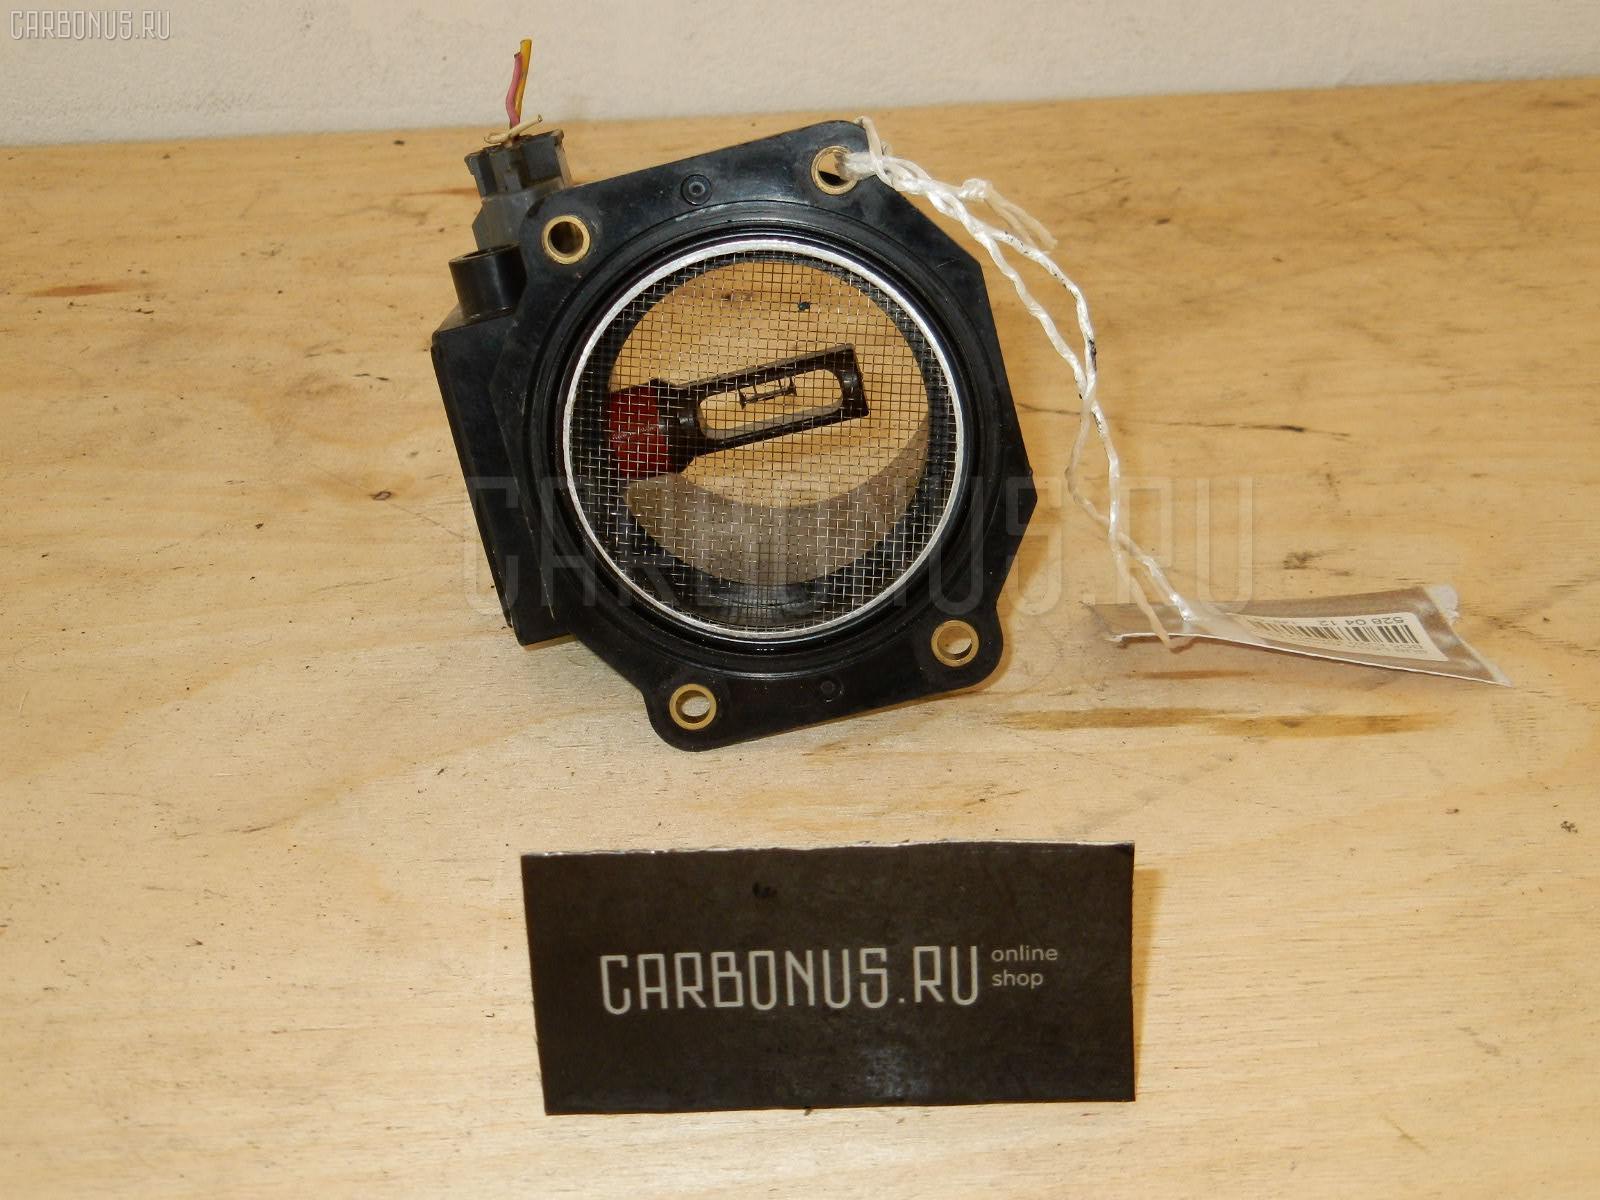 Датчик расхода воздуха SUBARU LEGACY WAGON BG5 EJ20 Фото 1